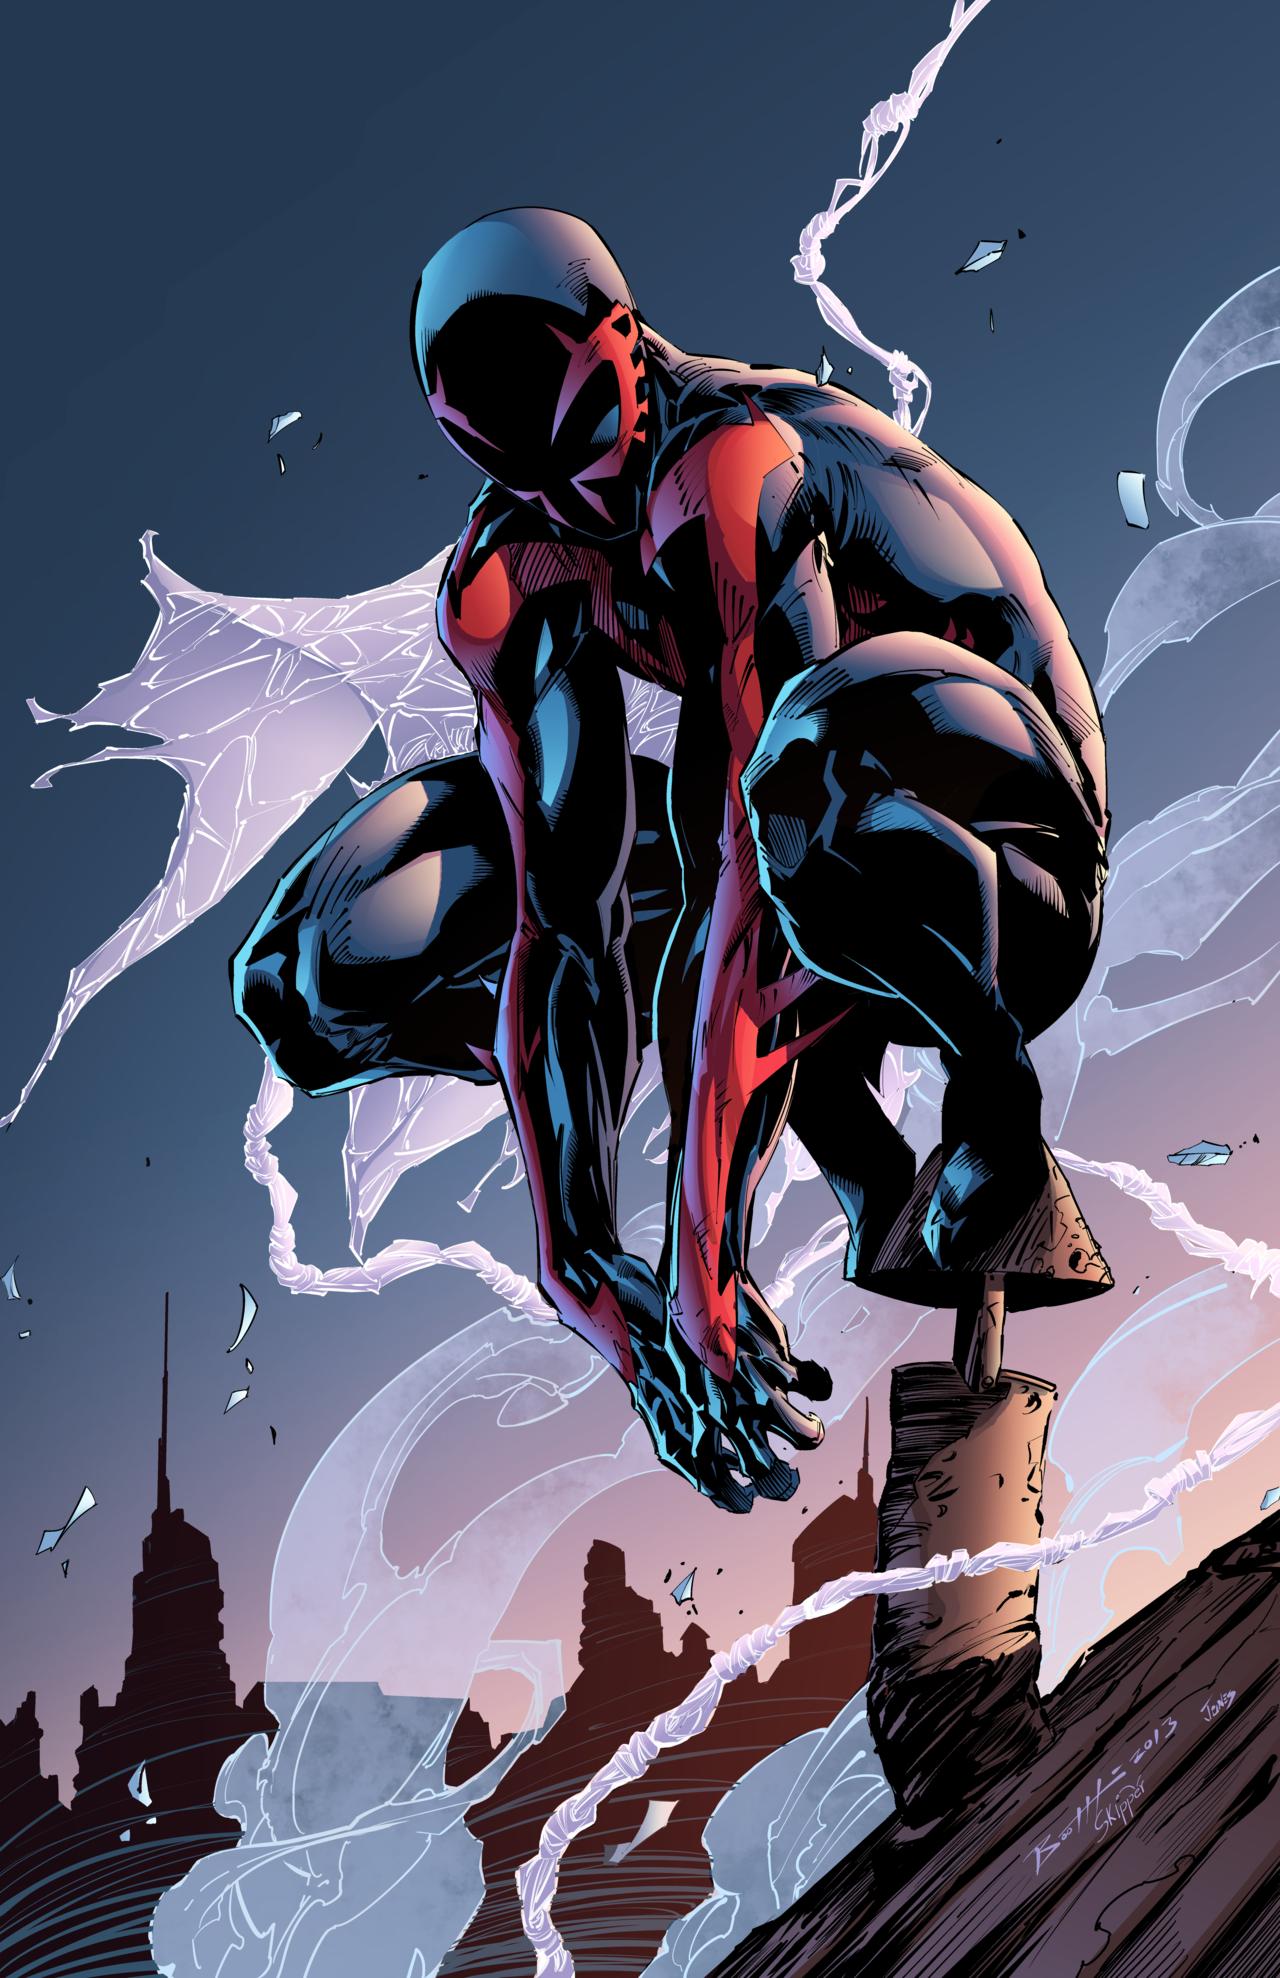 Ultimate Captain America vs Spiderman 2099   Battles   Comic Vine 1280x1978